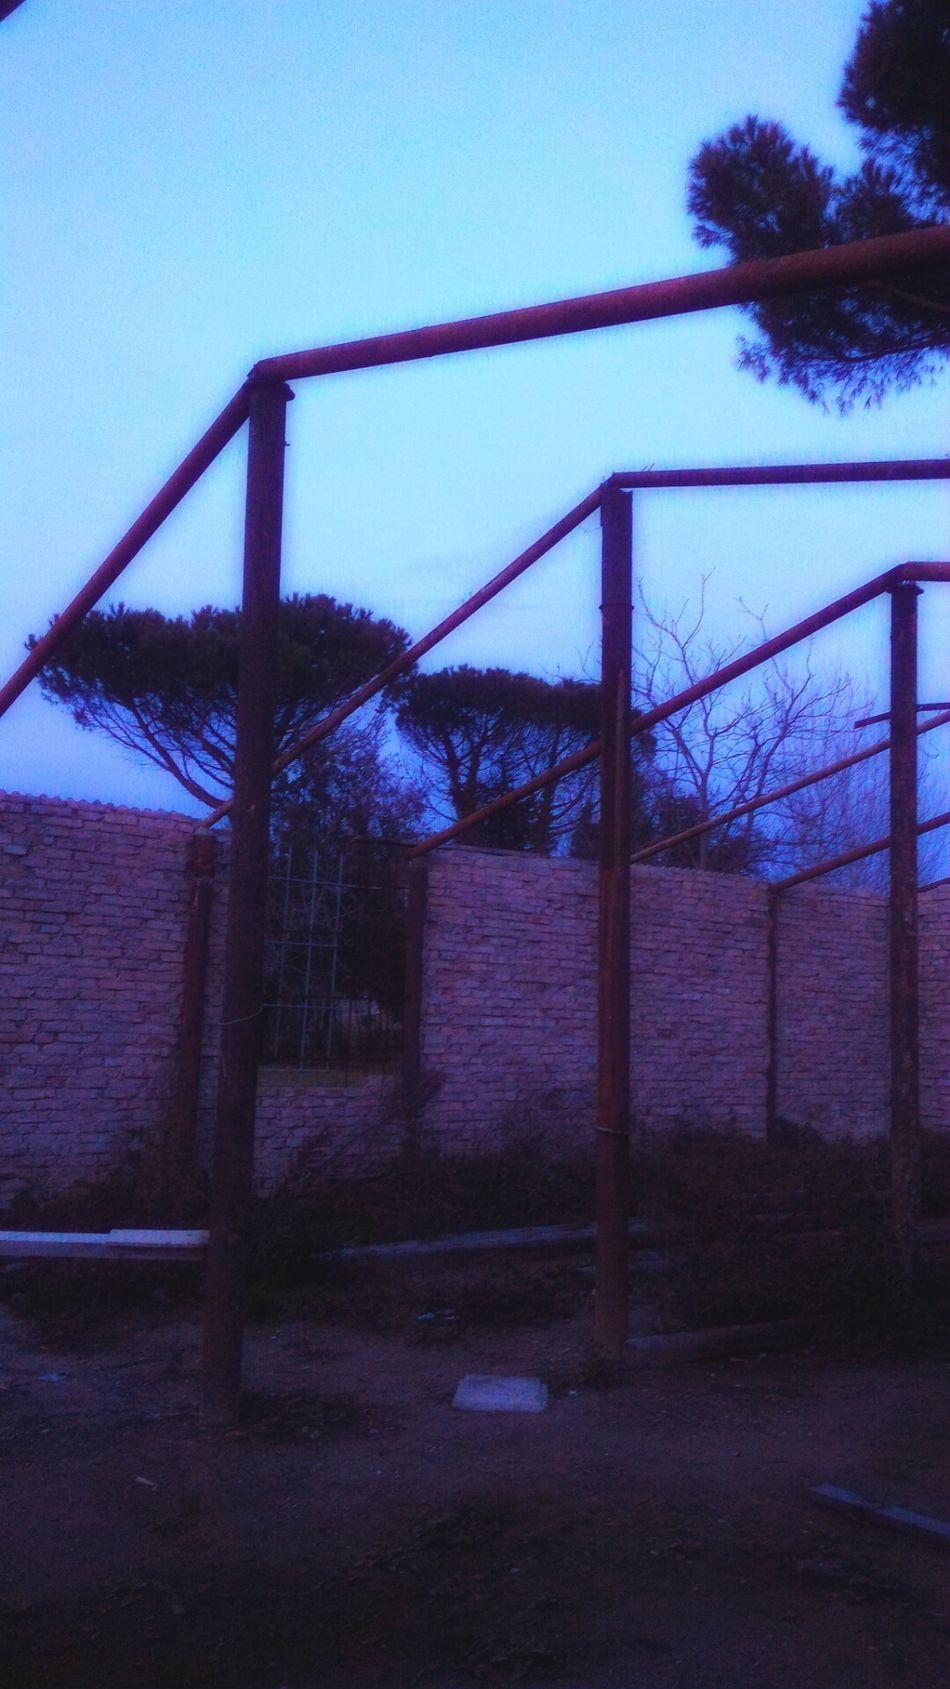 Ruins Rovine Openroof Tettoaperto Architecture No People Outdoors Built Structure Casa House Mattoni Bricks Ferri Irons Sky Cielo